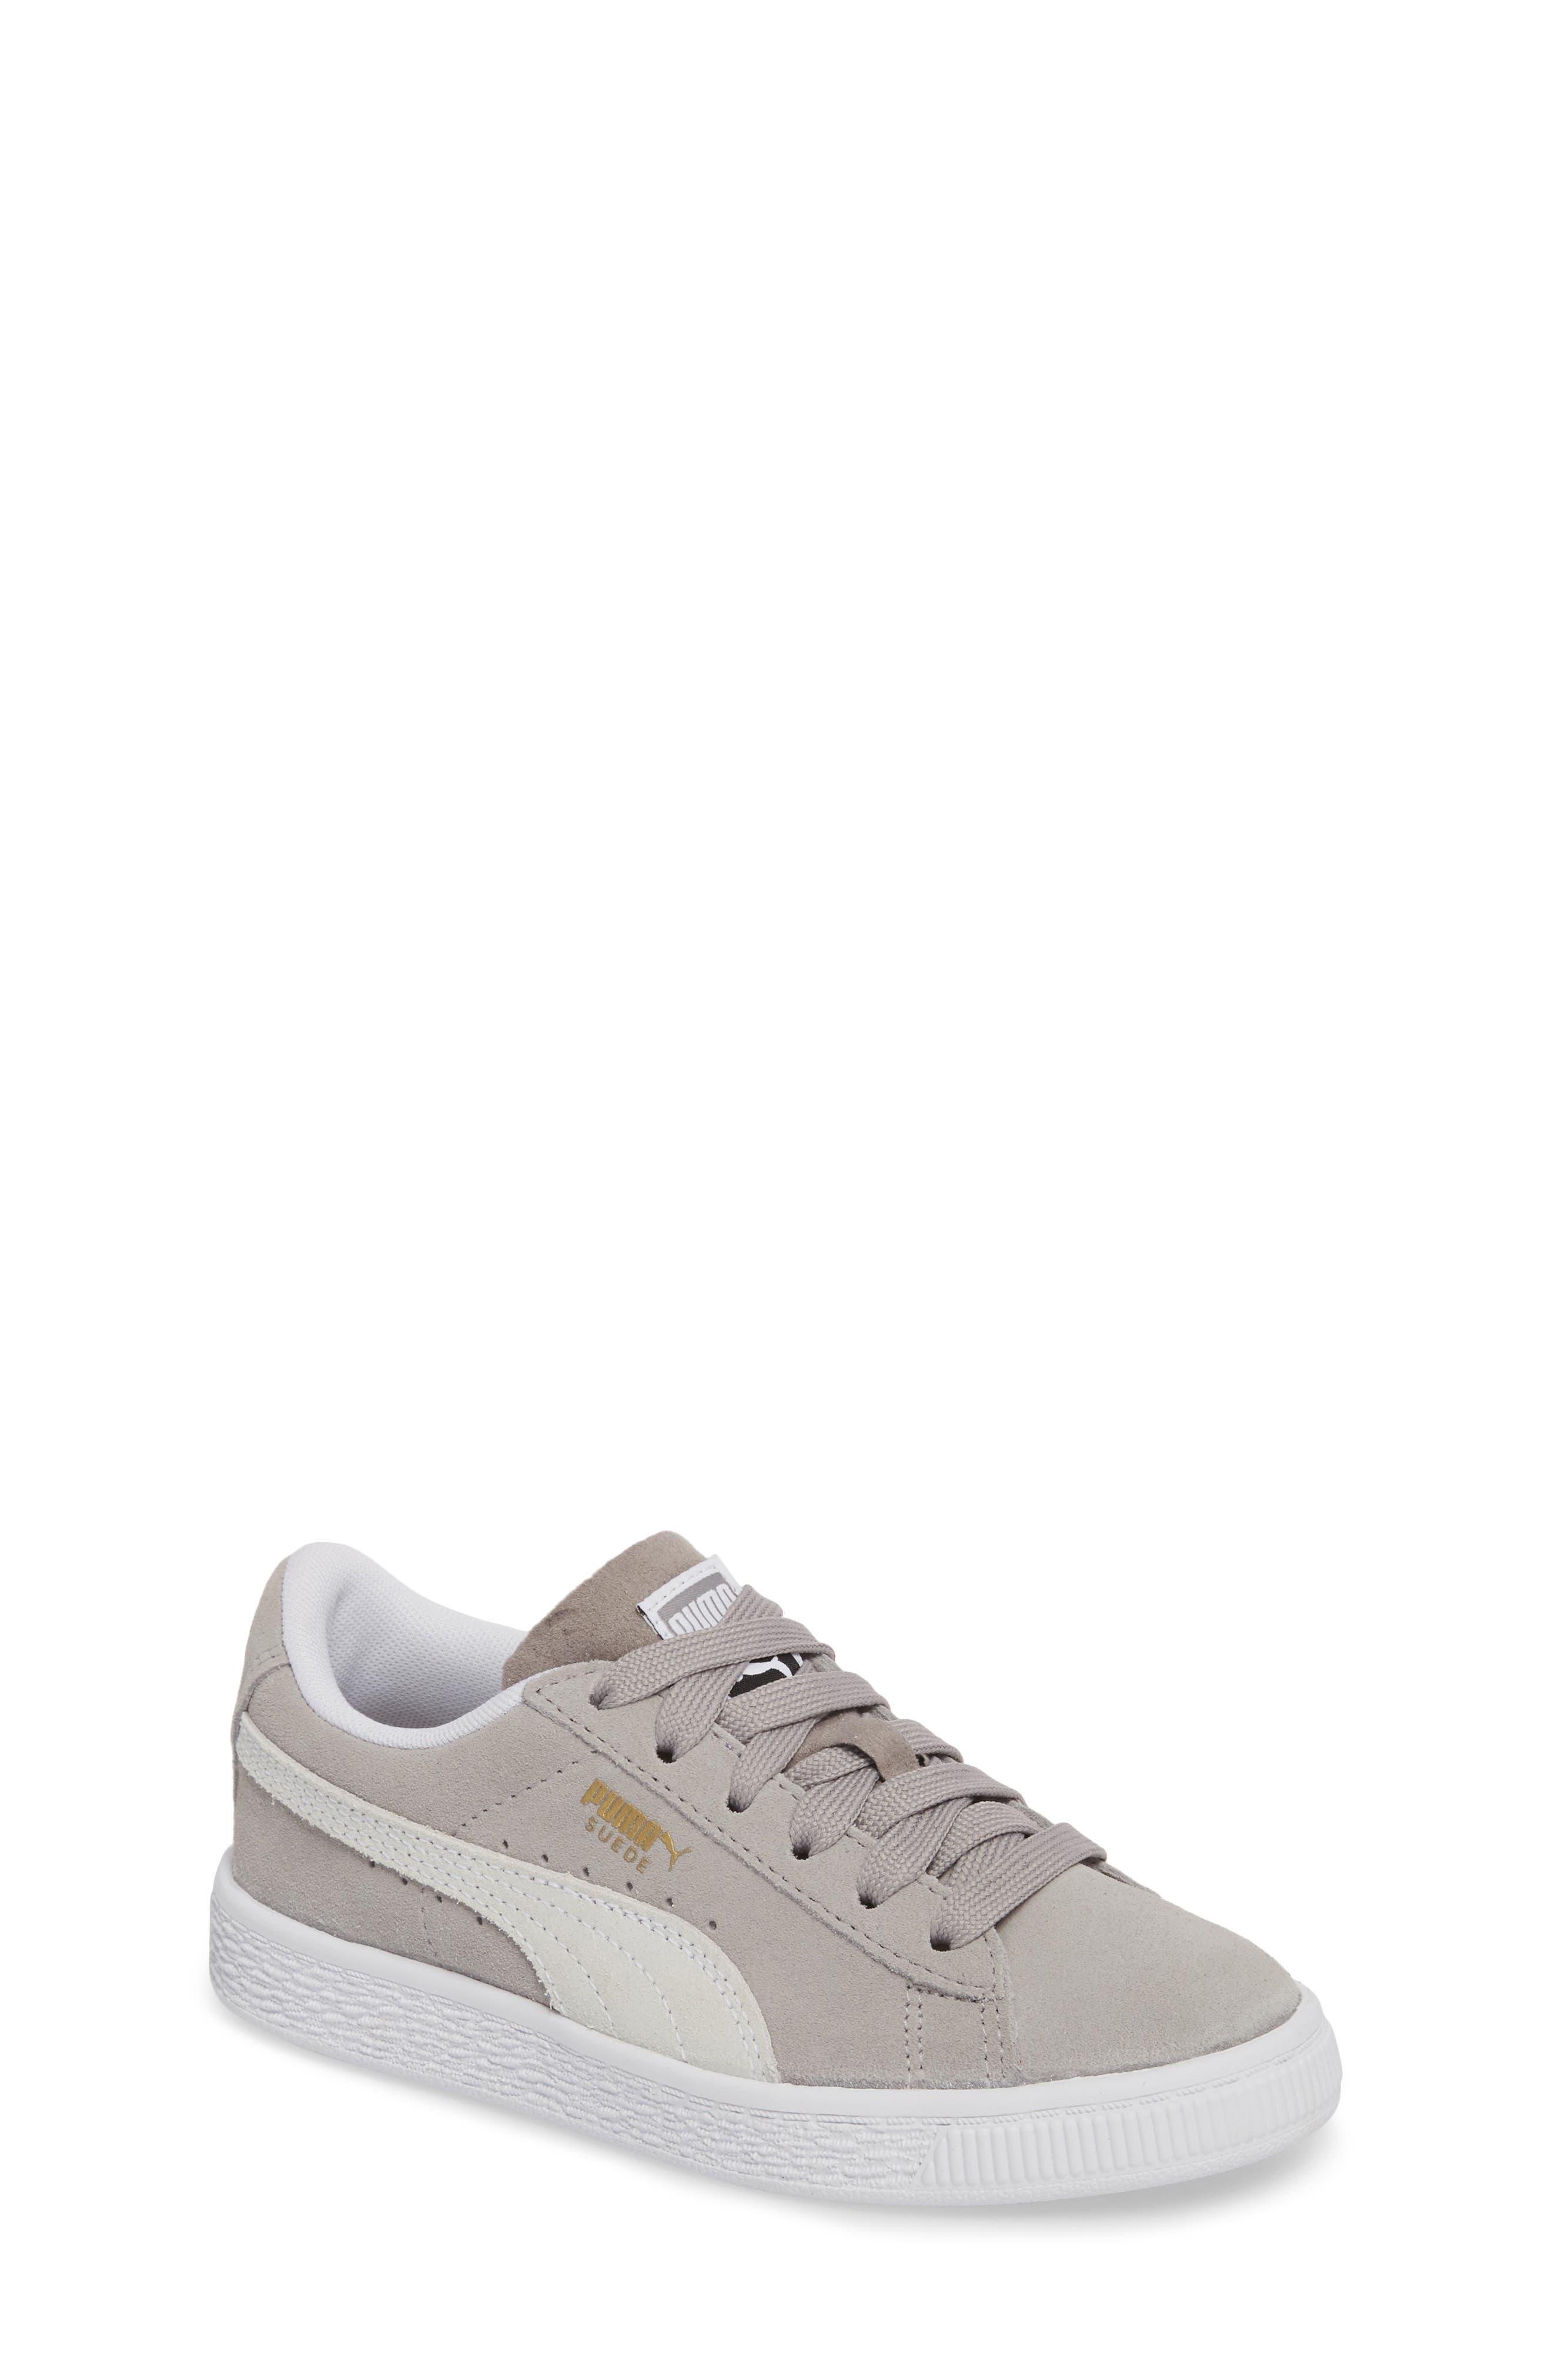 Suede Sneaker,                             Main thumbnail 1, color,                             Ash/ Puma White